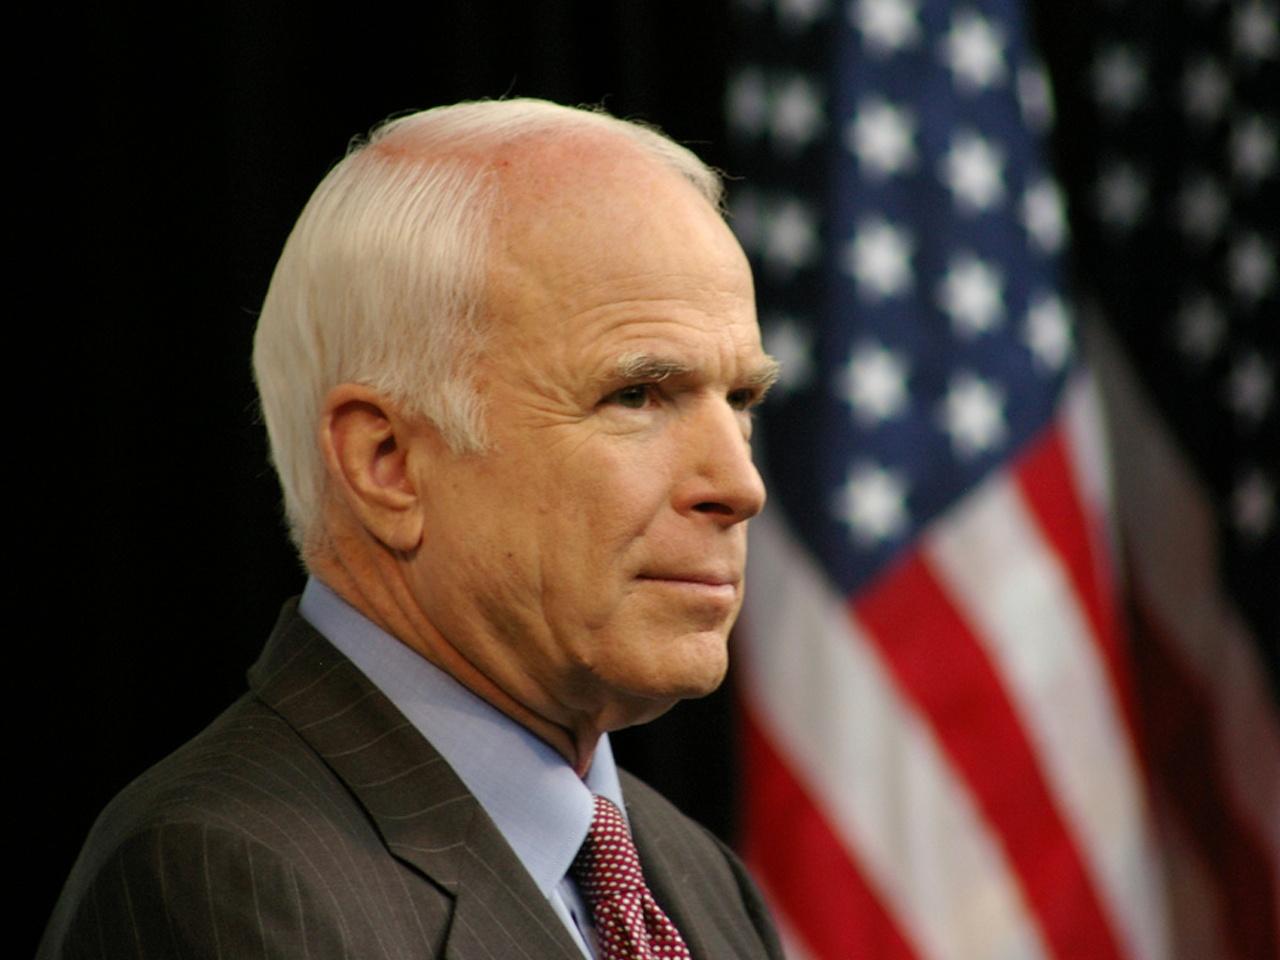 Senator John McCain's Remarks at the 2017 Liberty Medal Ceremony